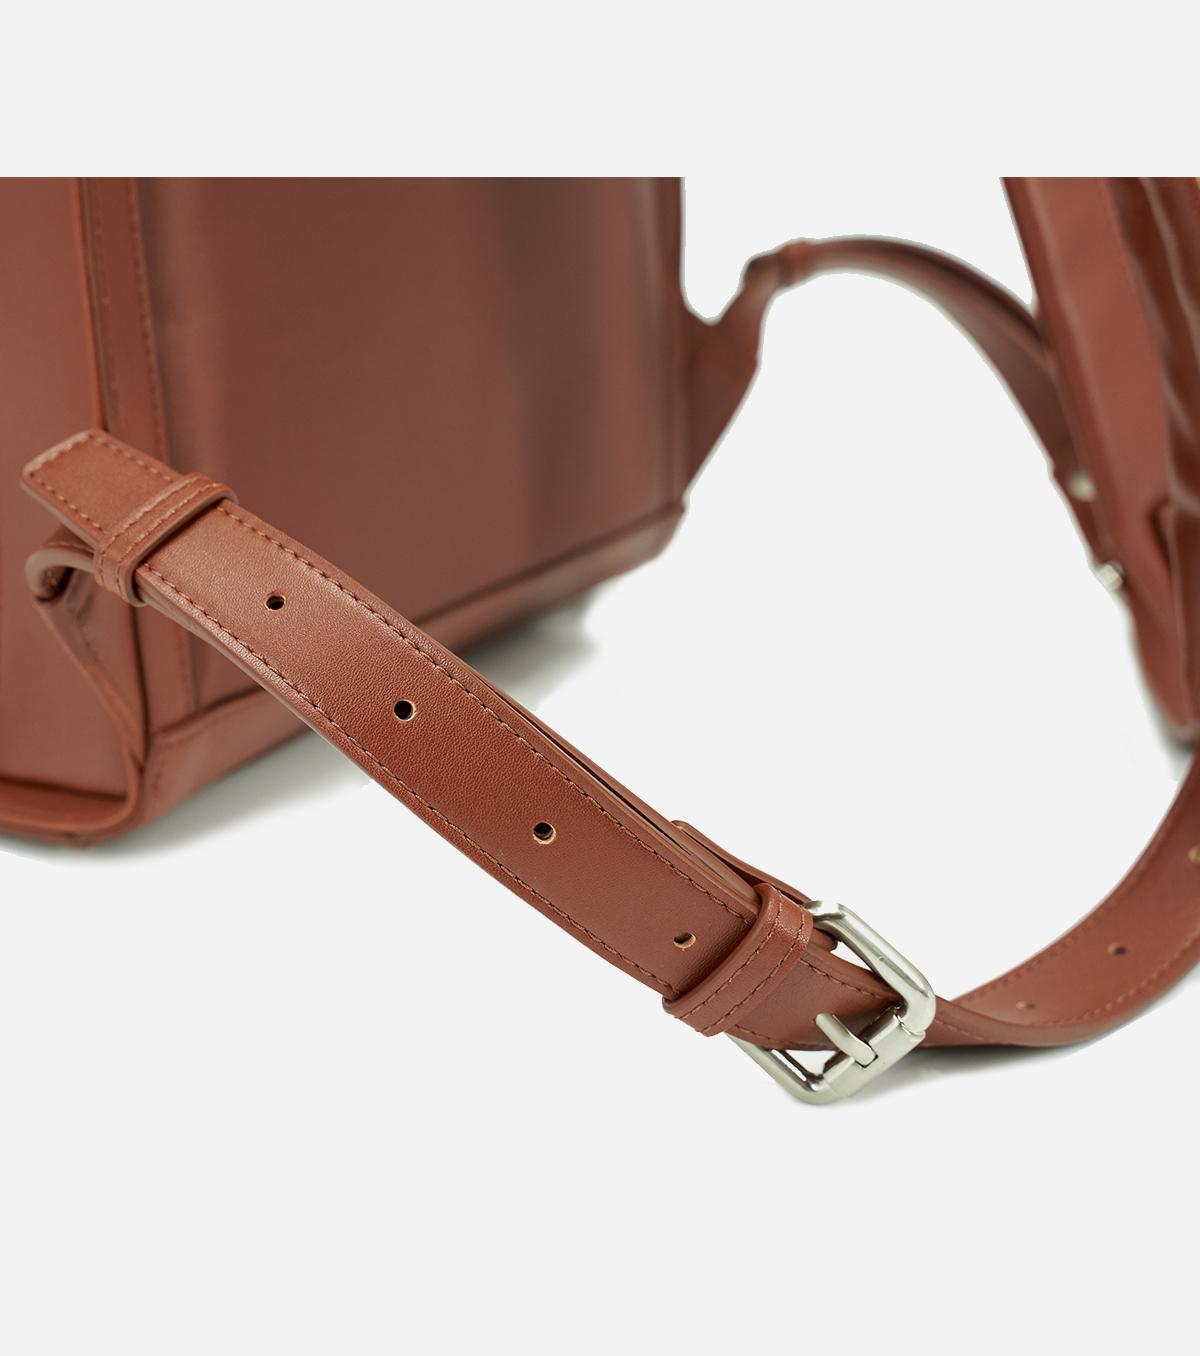 randoseru bag straps